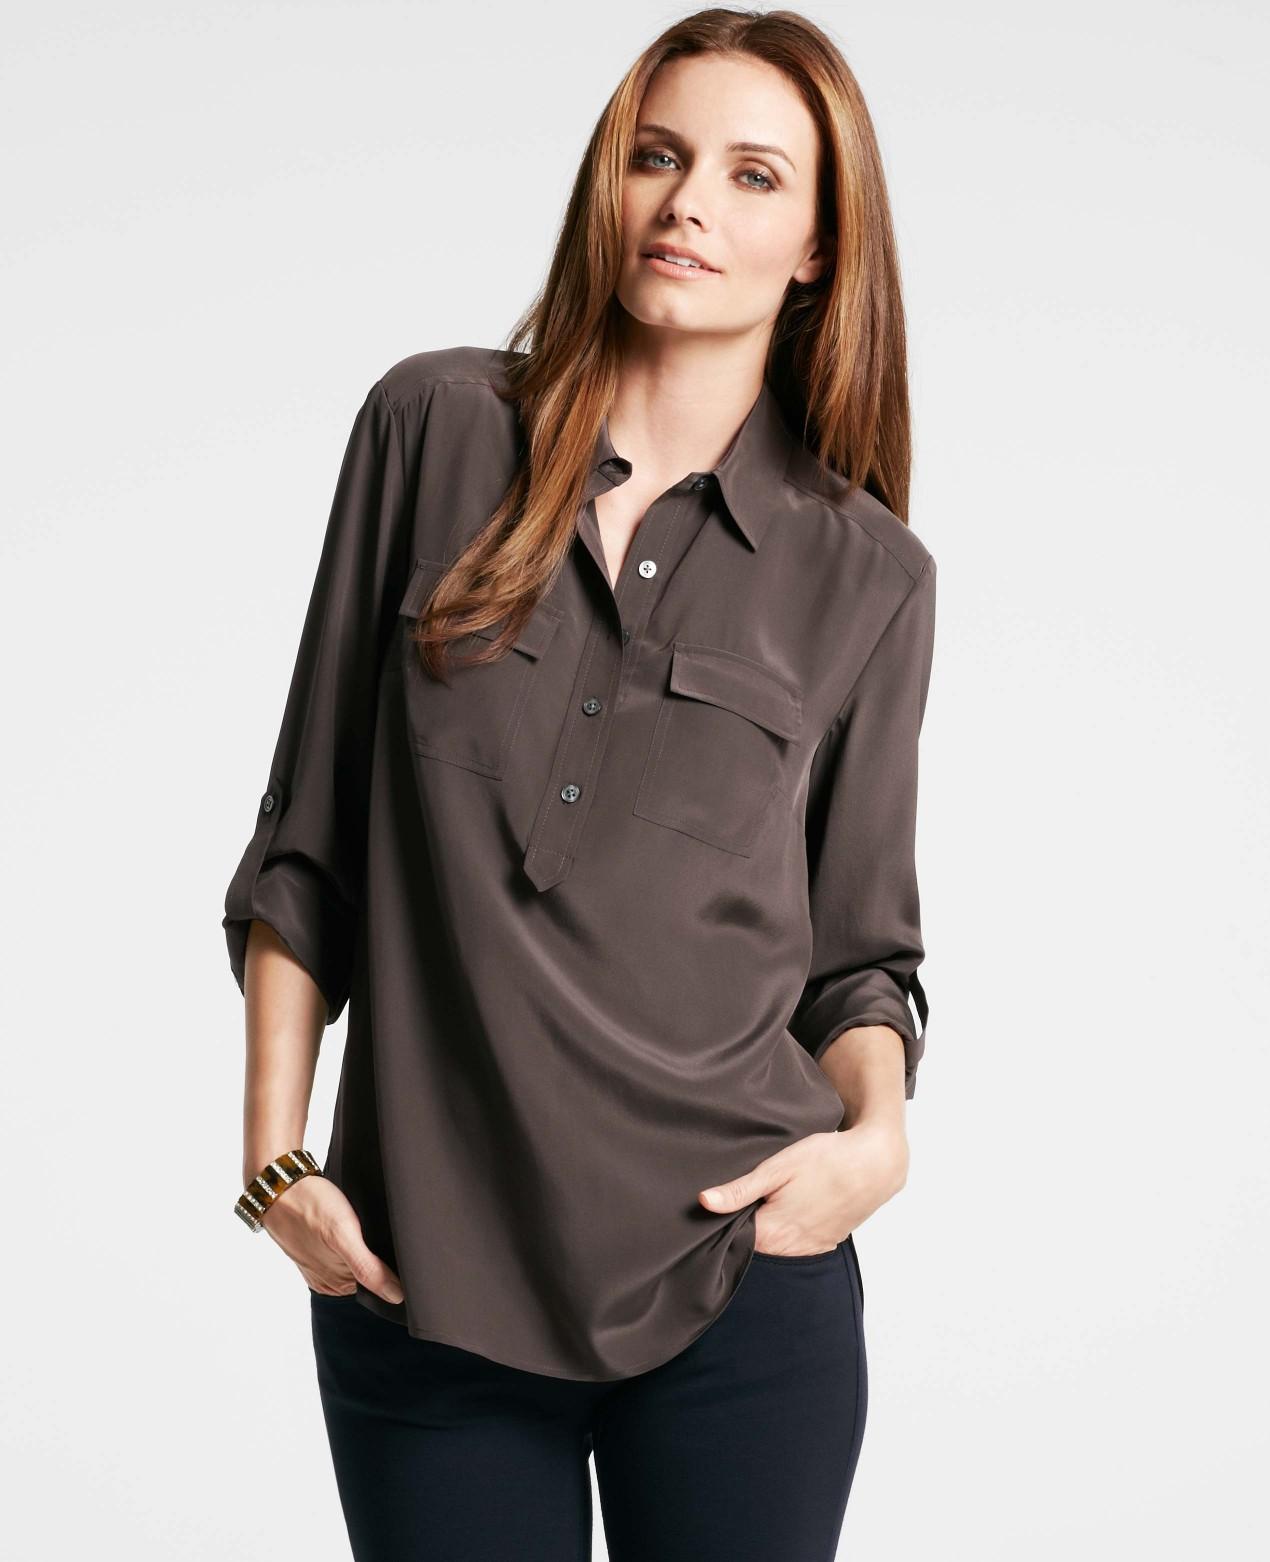 e2ed7ab8444d50 Ann Taylor Silk Camp Shirts - BCD Tofu House